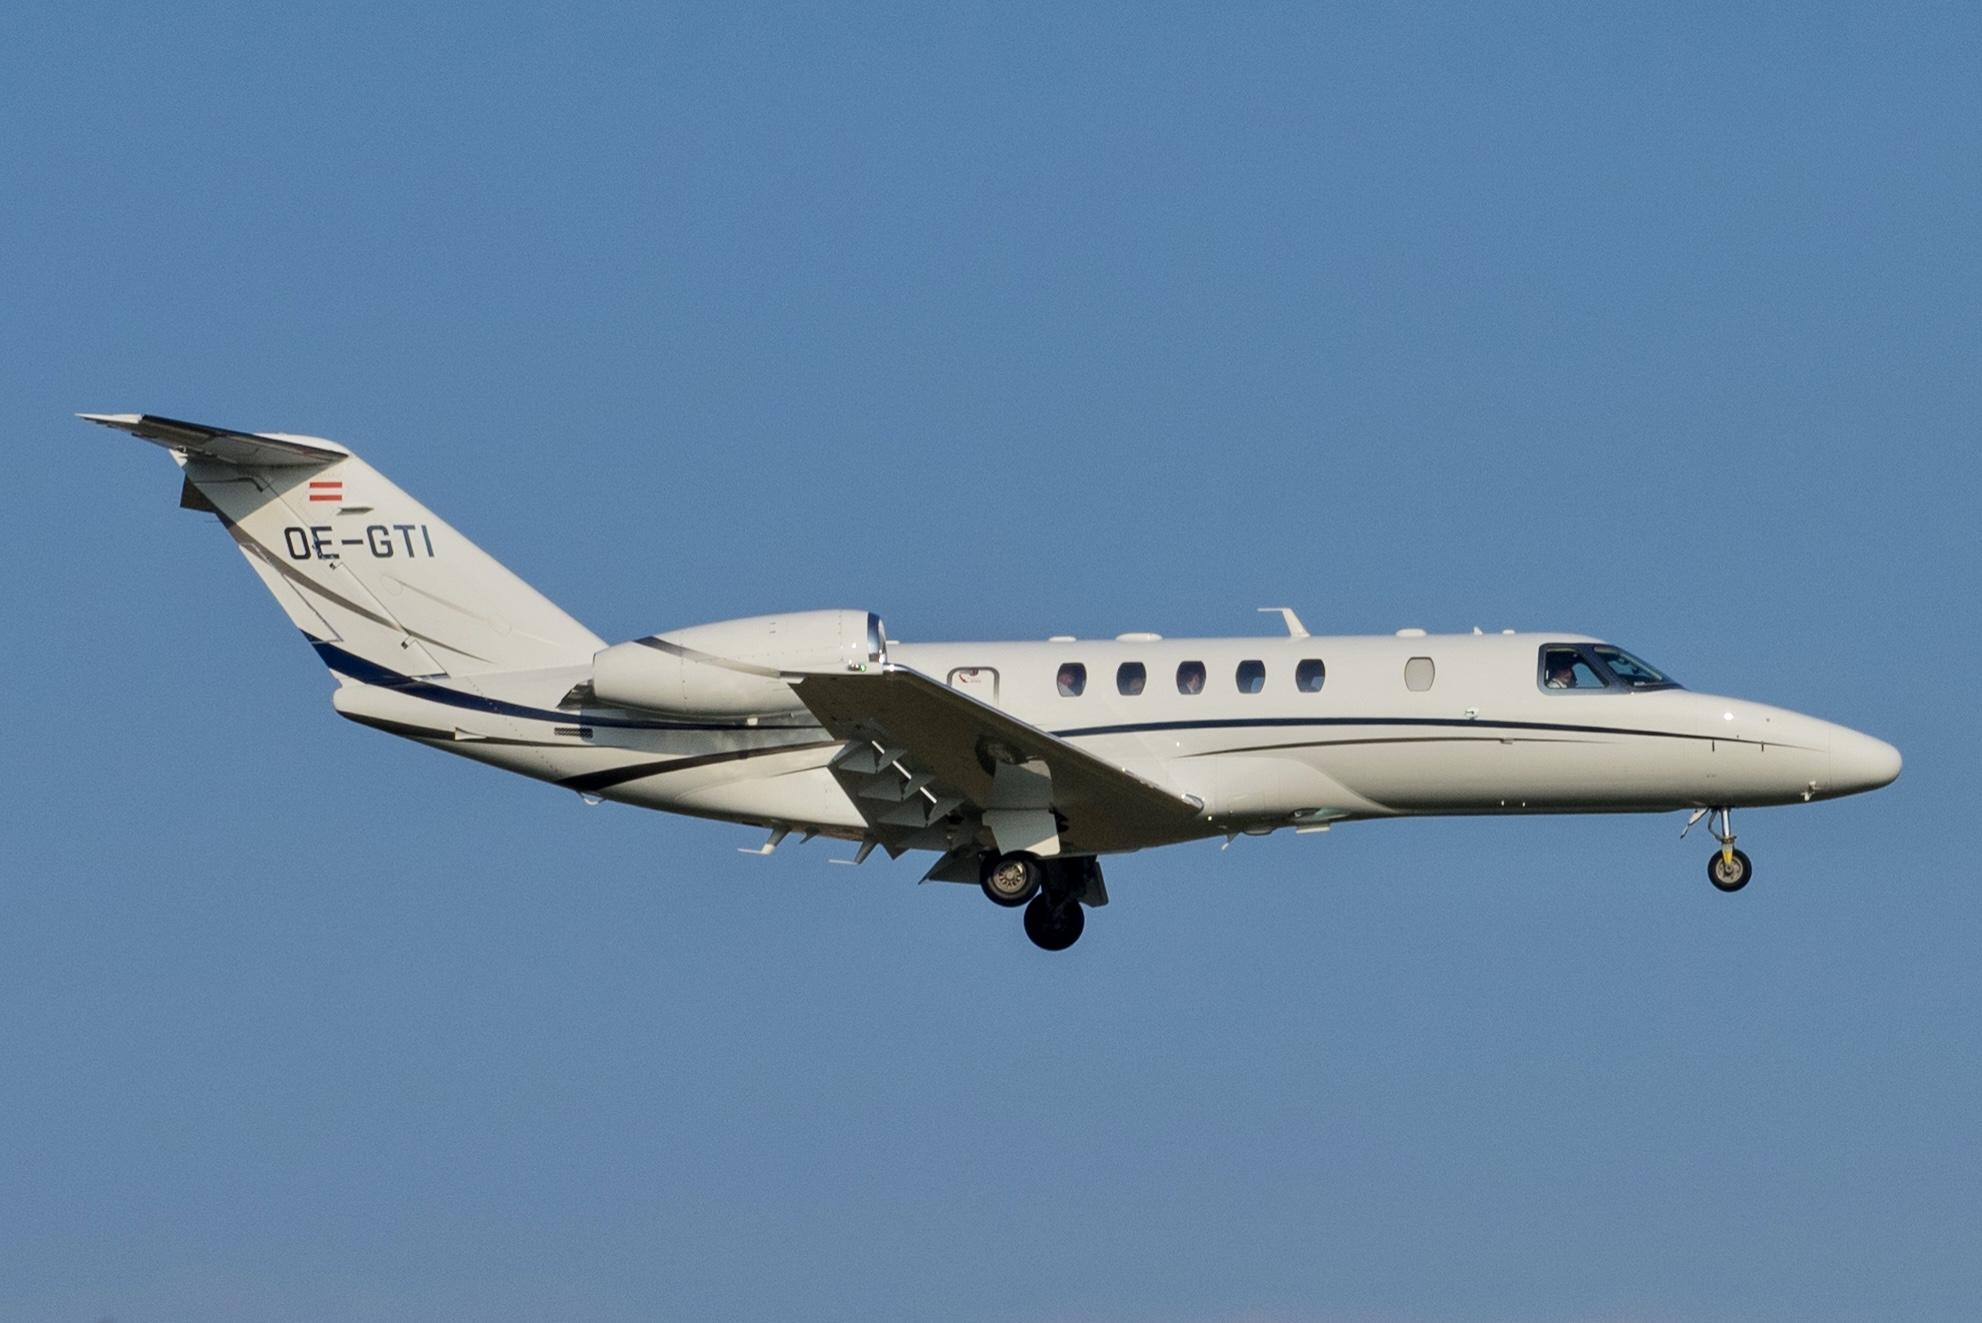 файл Oe Gti Cessna 525c Citation Cj4 C25c 25224411064 Jpg